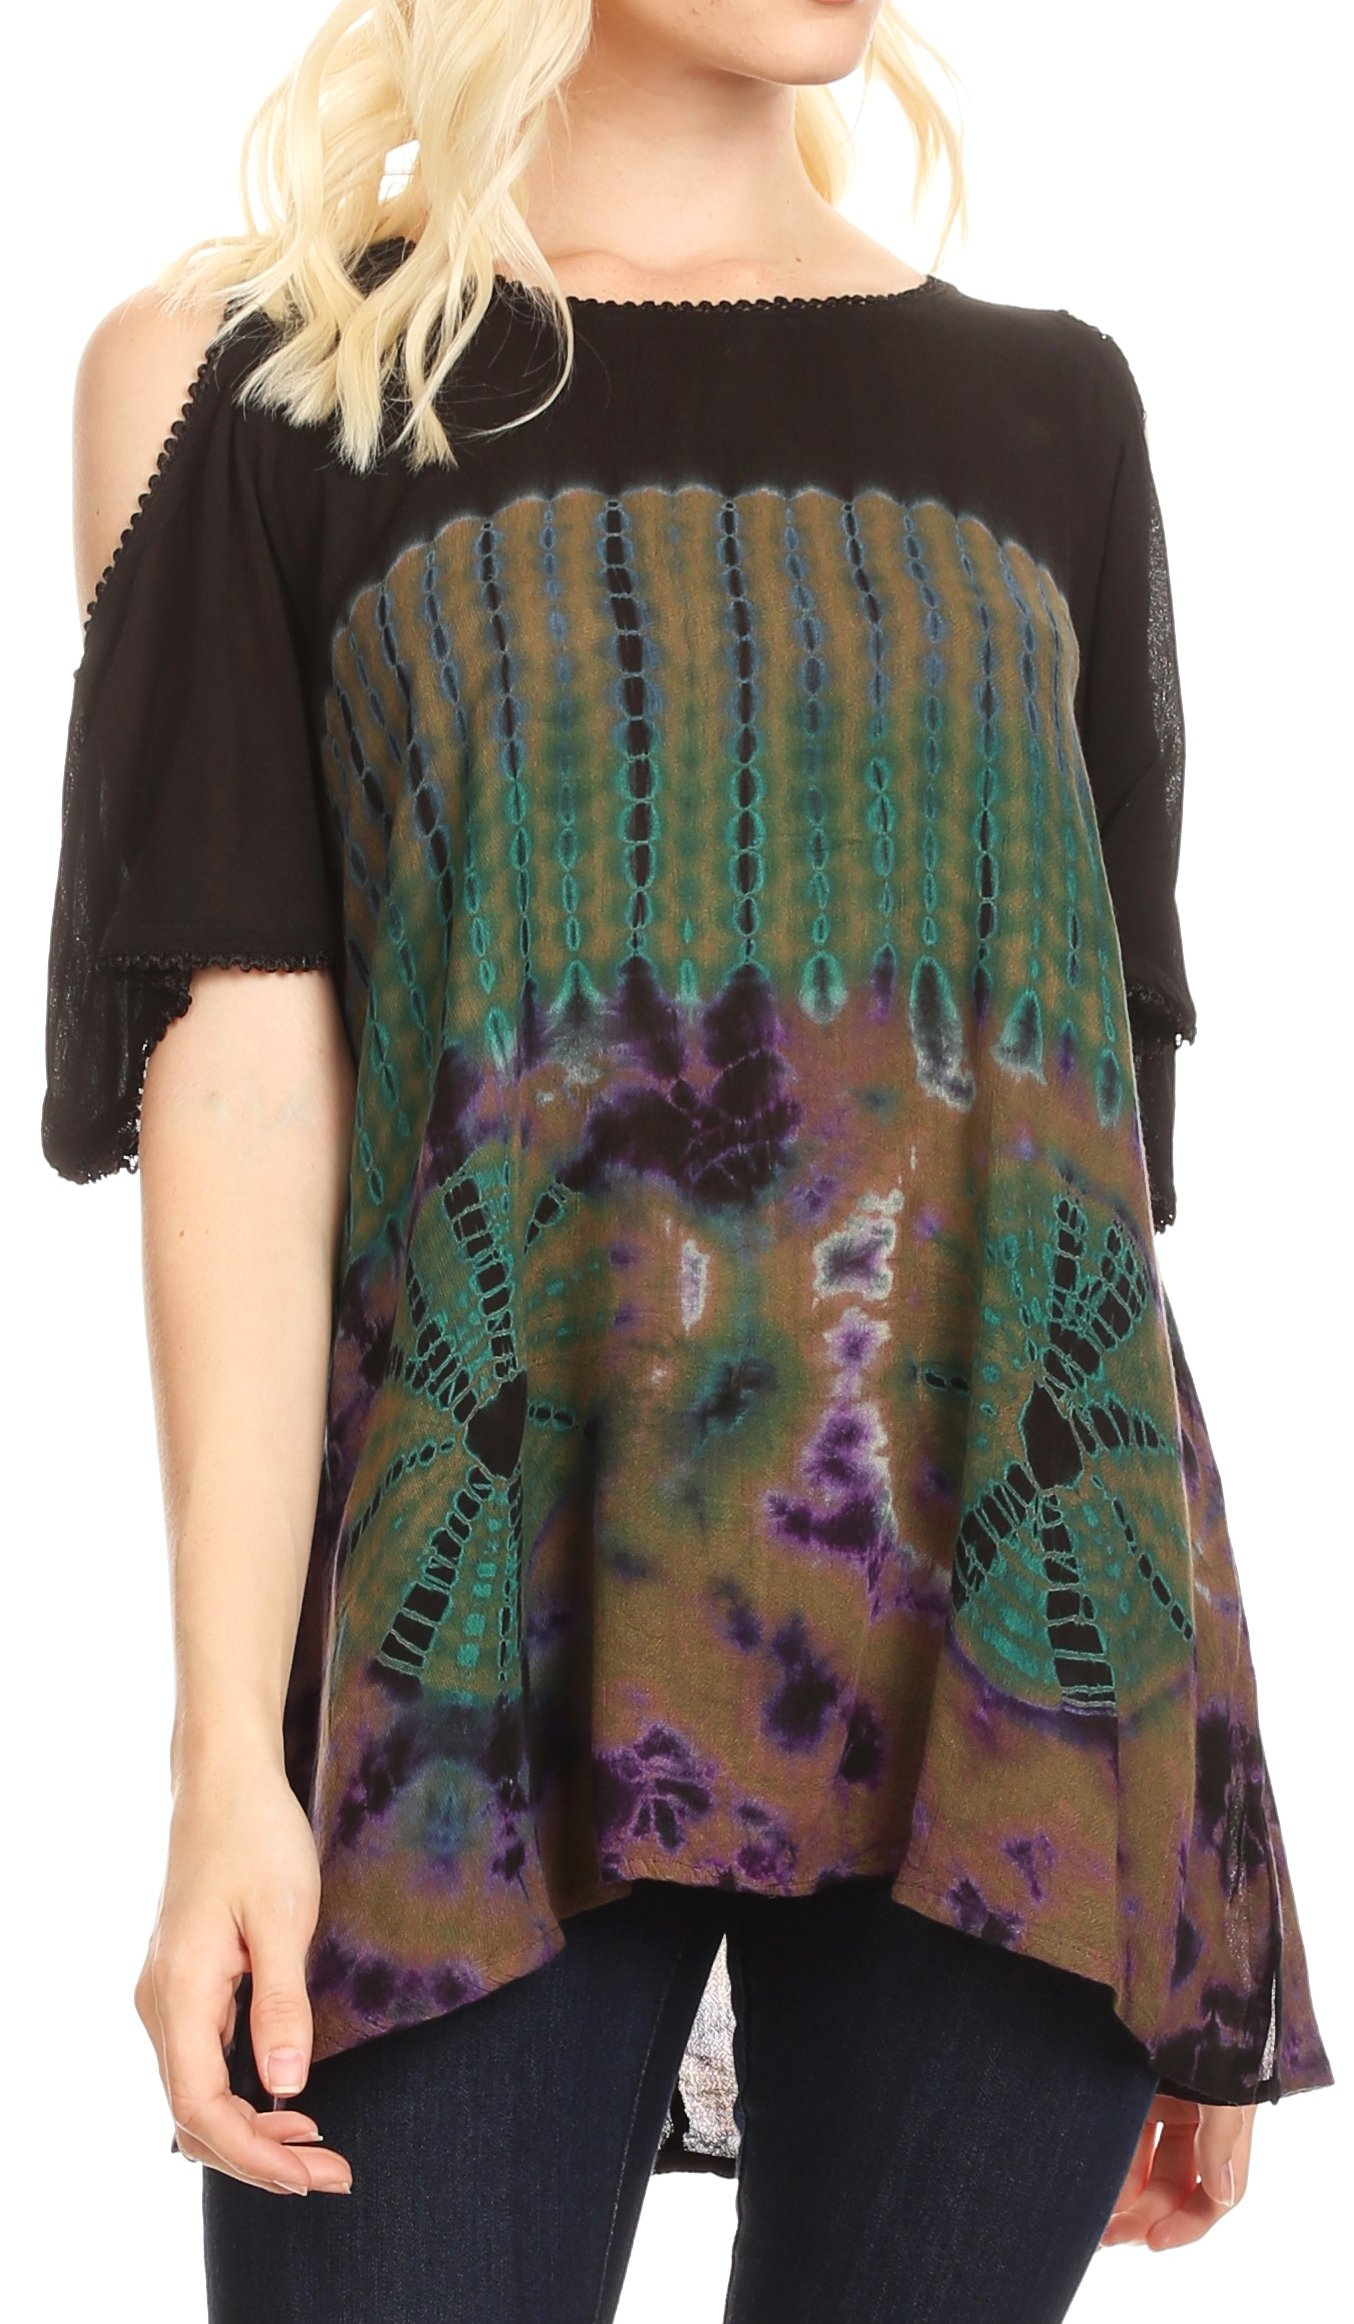 Sakkas 18789 - Luz Womens Cold Shoulder Bohemian Ethnic Style Blouse Top Tie Dye Flare - Olive - OSP